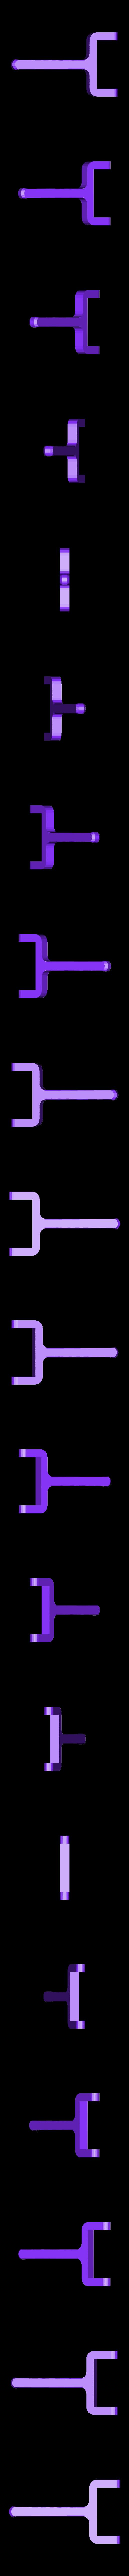 grip_large.stl Download free STL file Fascia Roll • Model to 3D print, noctaro